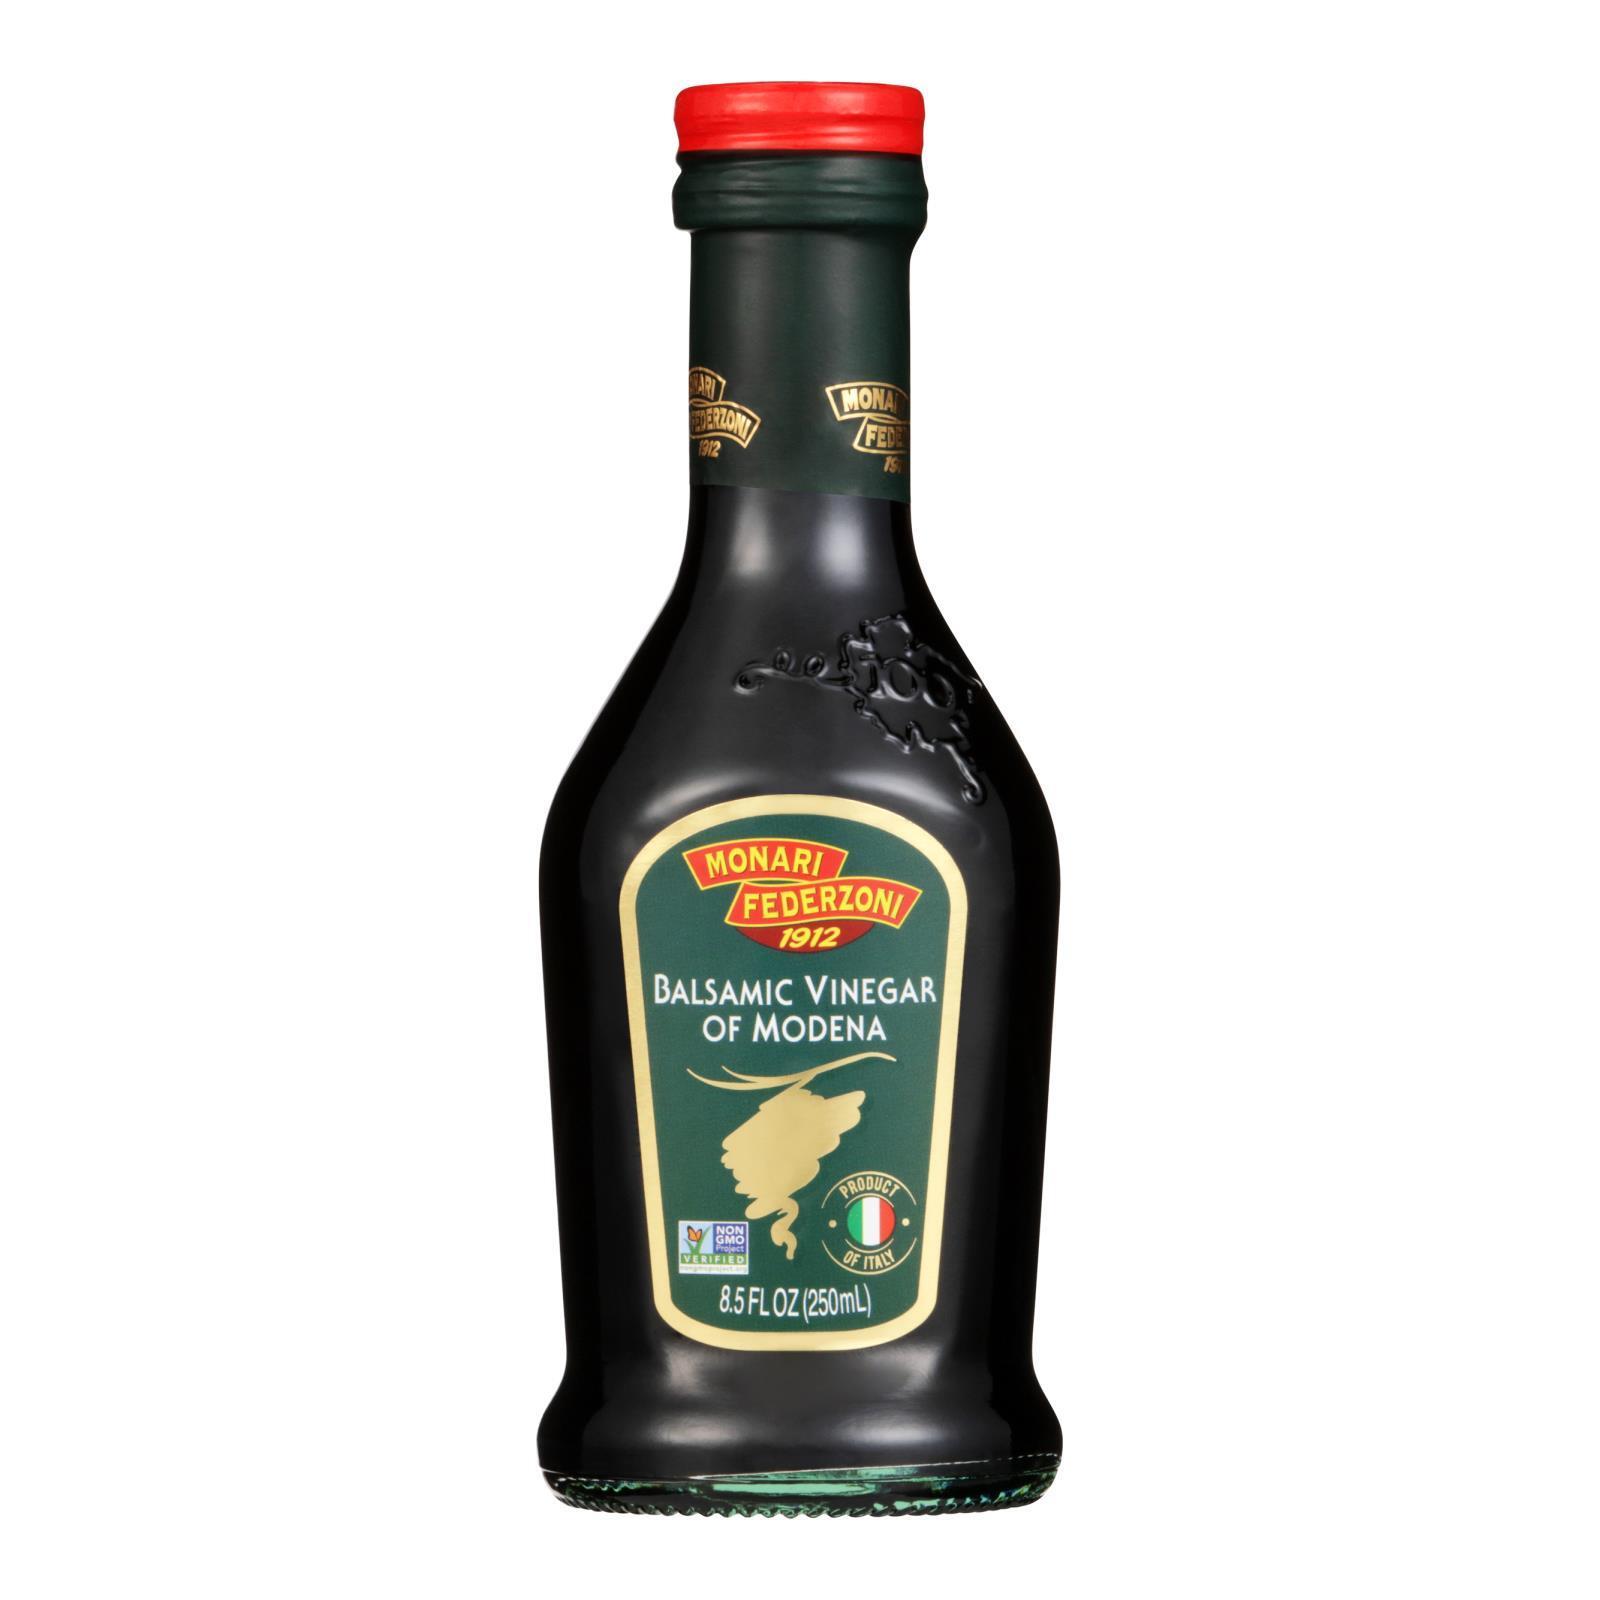 Monari Federzoni Balsamic Vinegar - Case of 6 - 8.5 fl oz